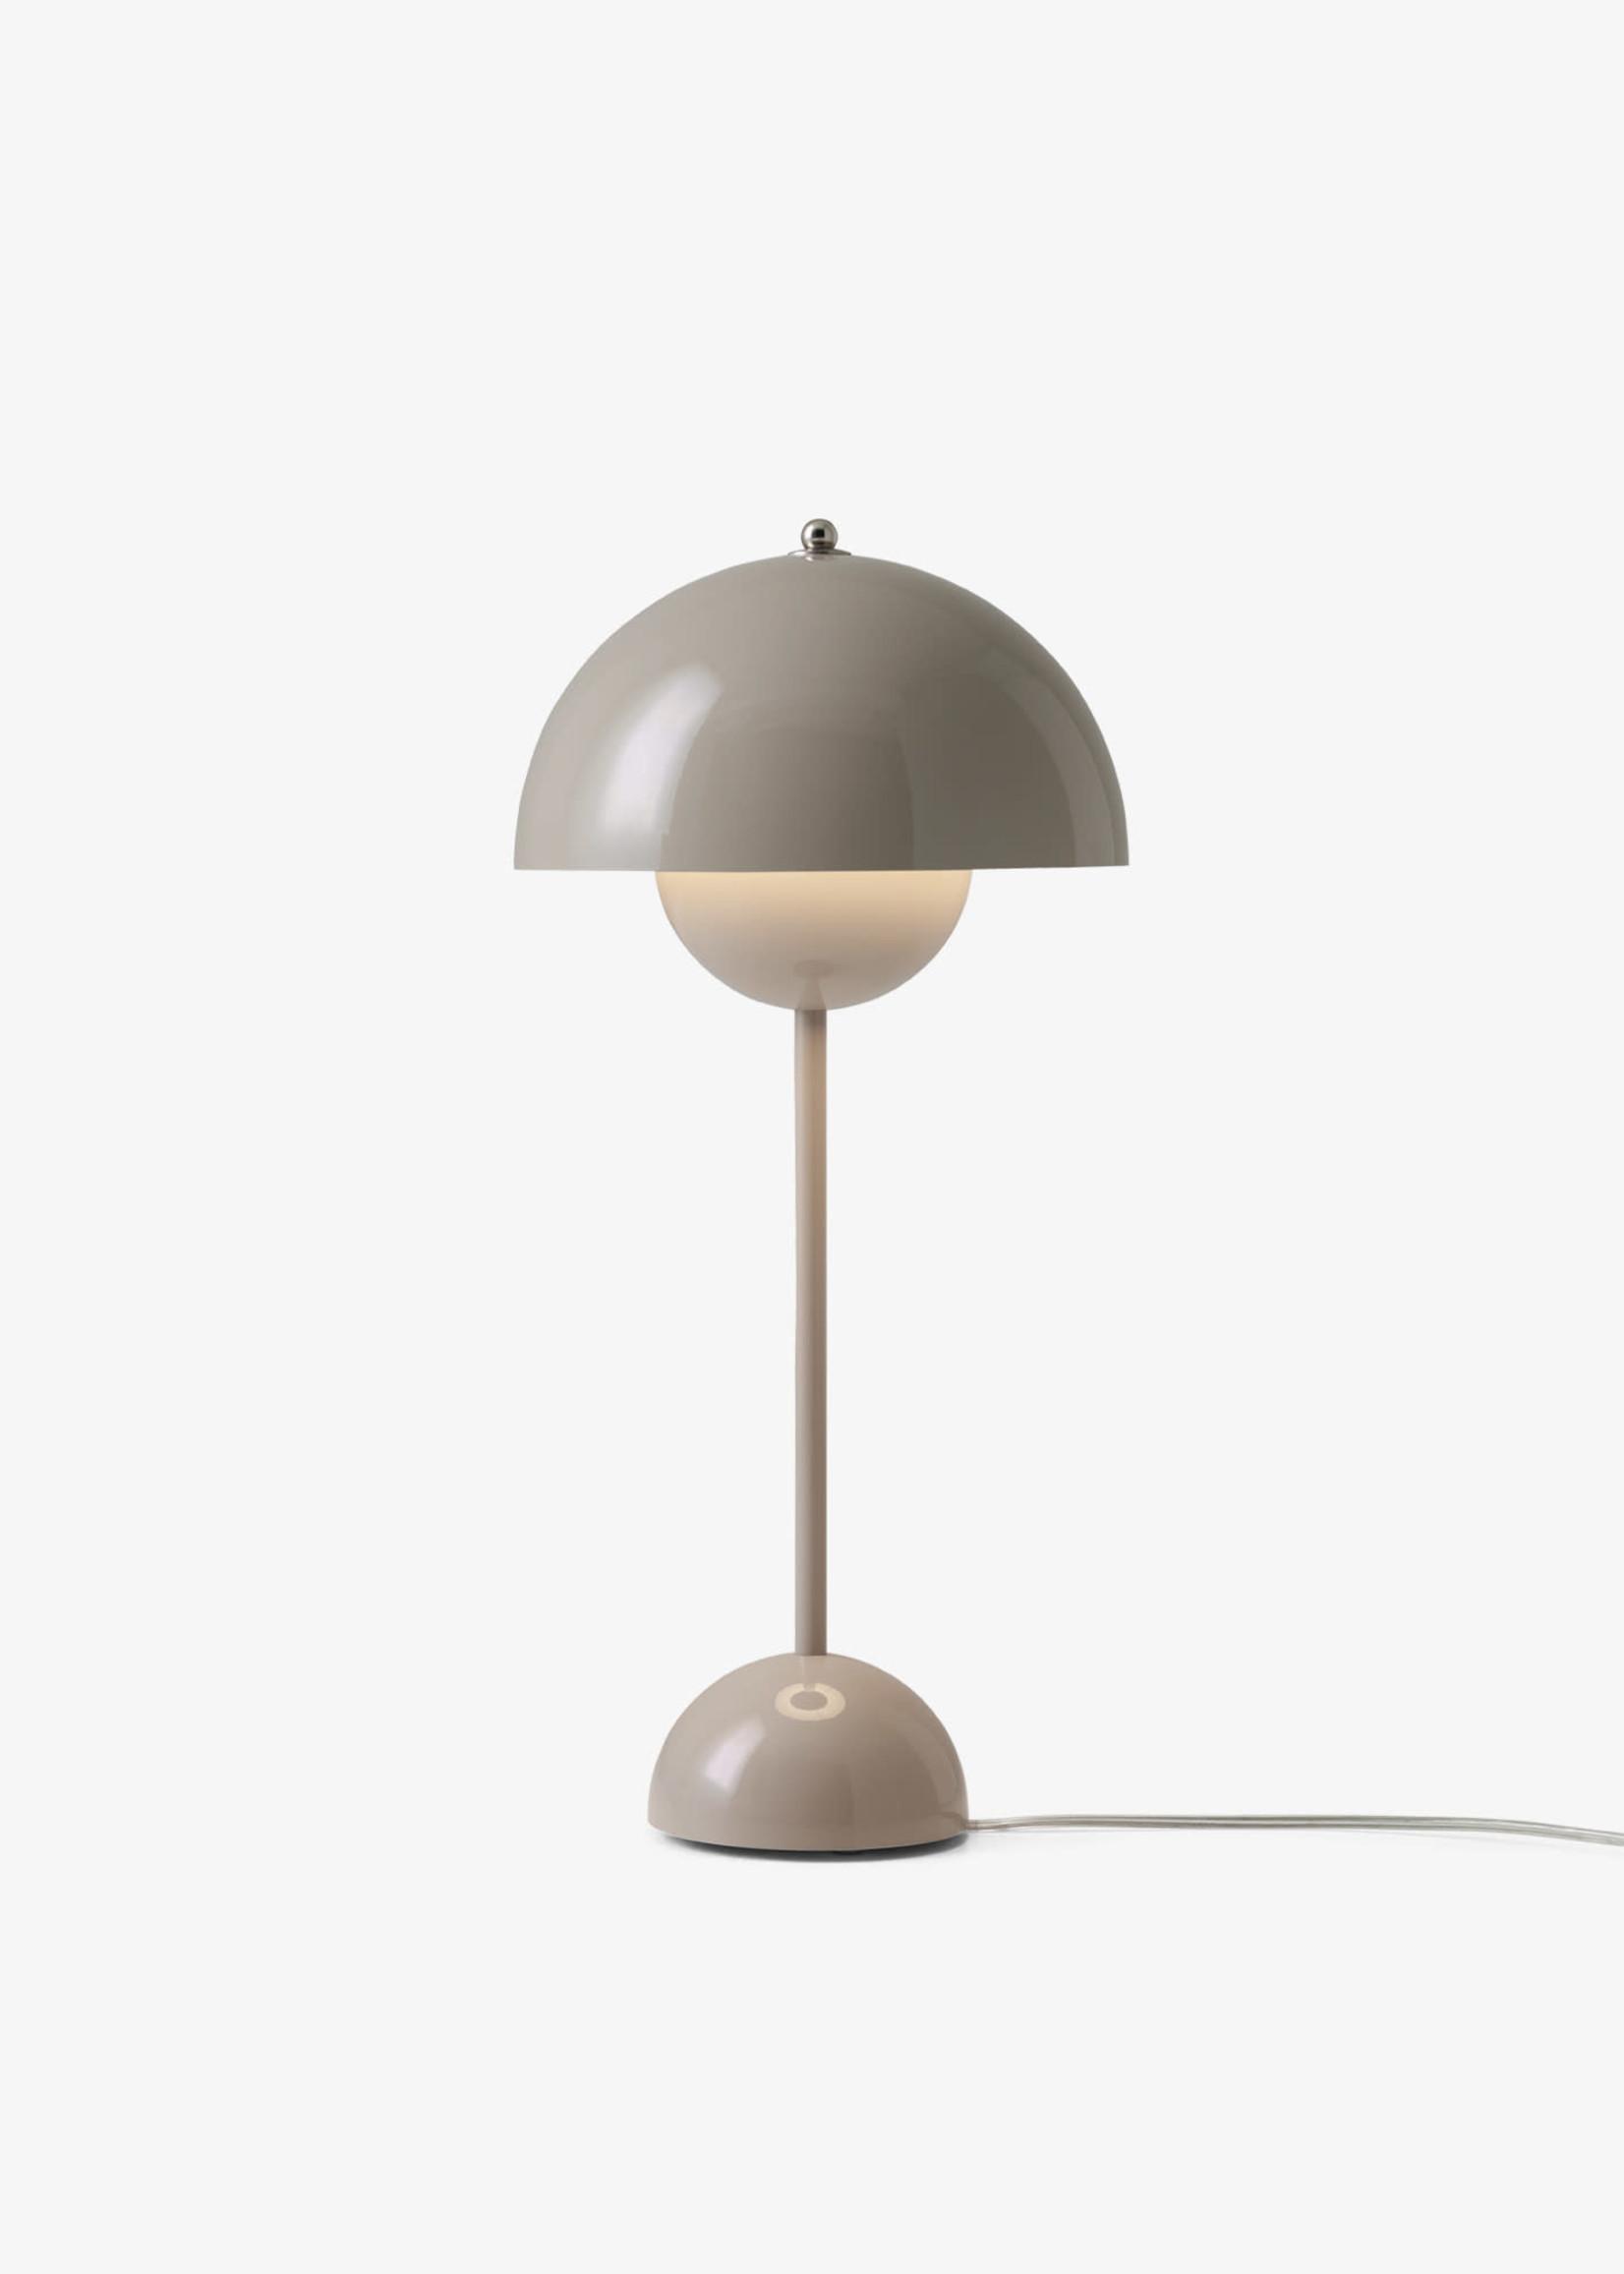 & Tradition Verner Panton Flower Pot Table Lamp in Grey Beige